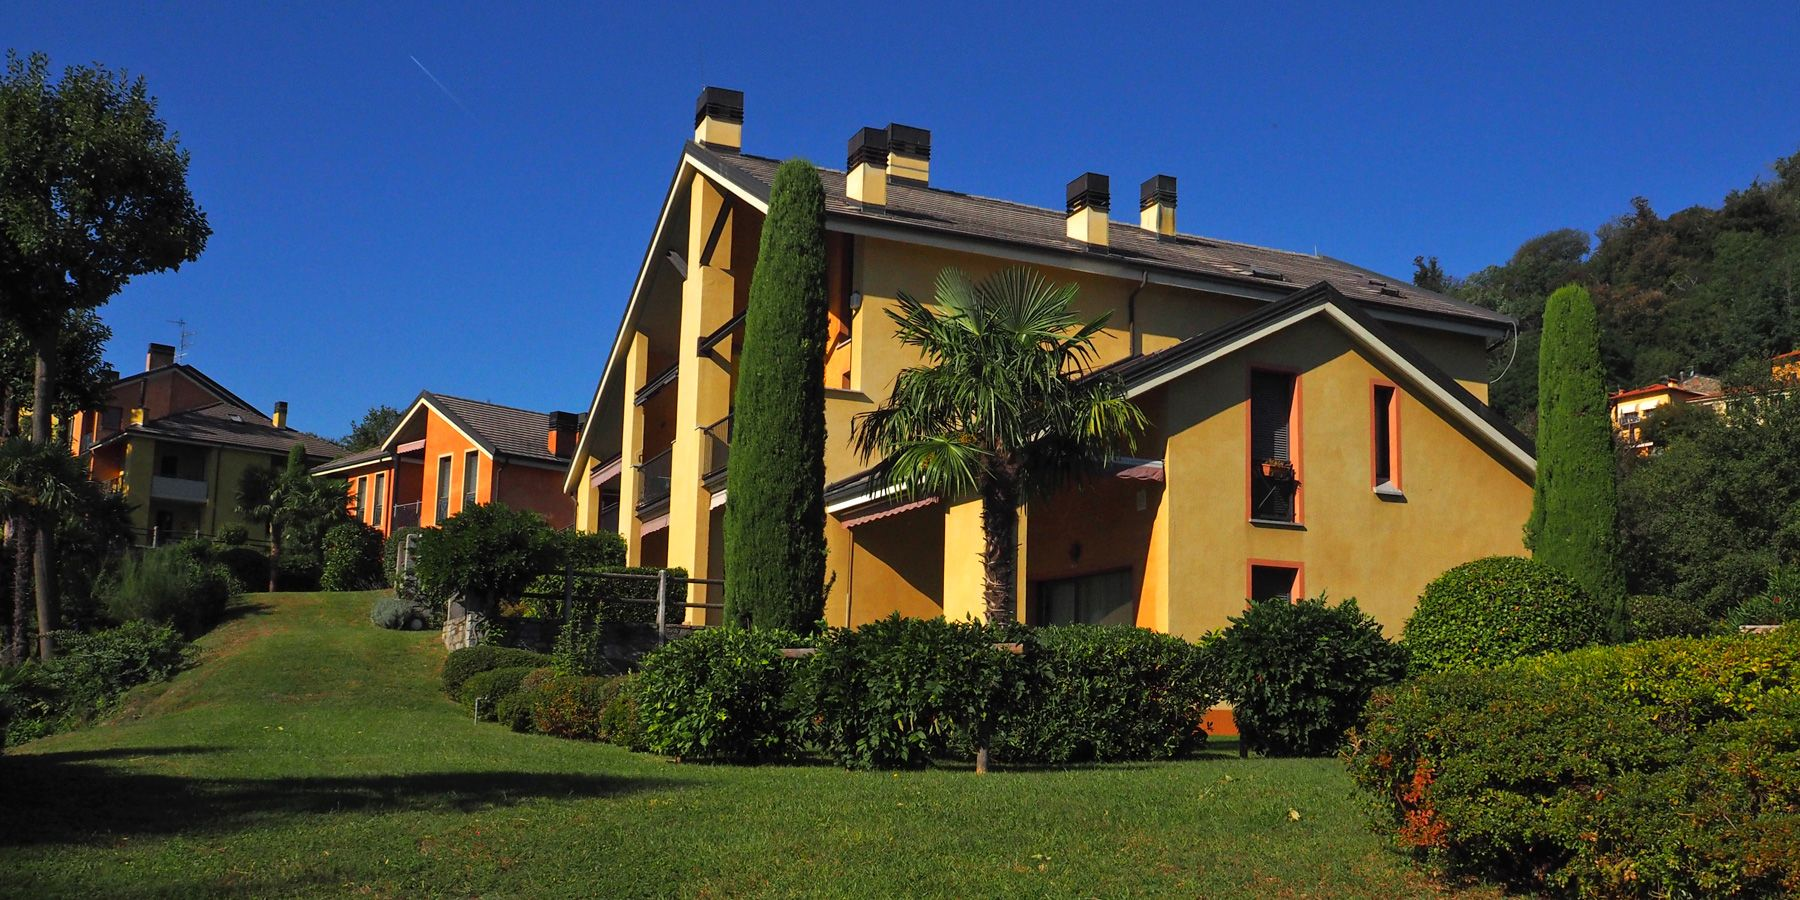 Wohnung zu kaufen in Ghiffa  in Villa Ada